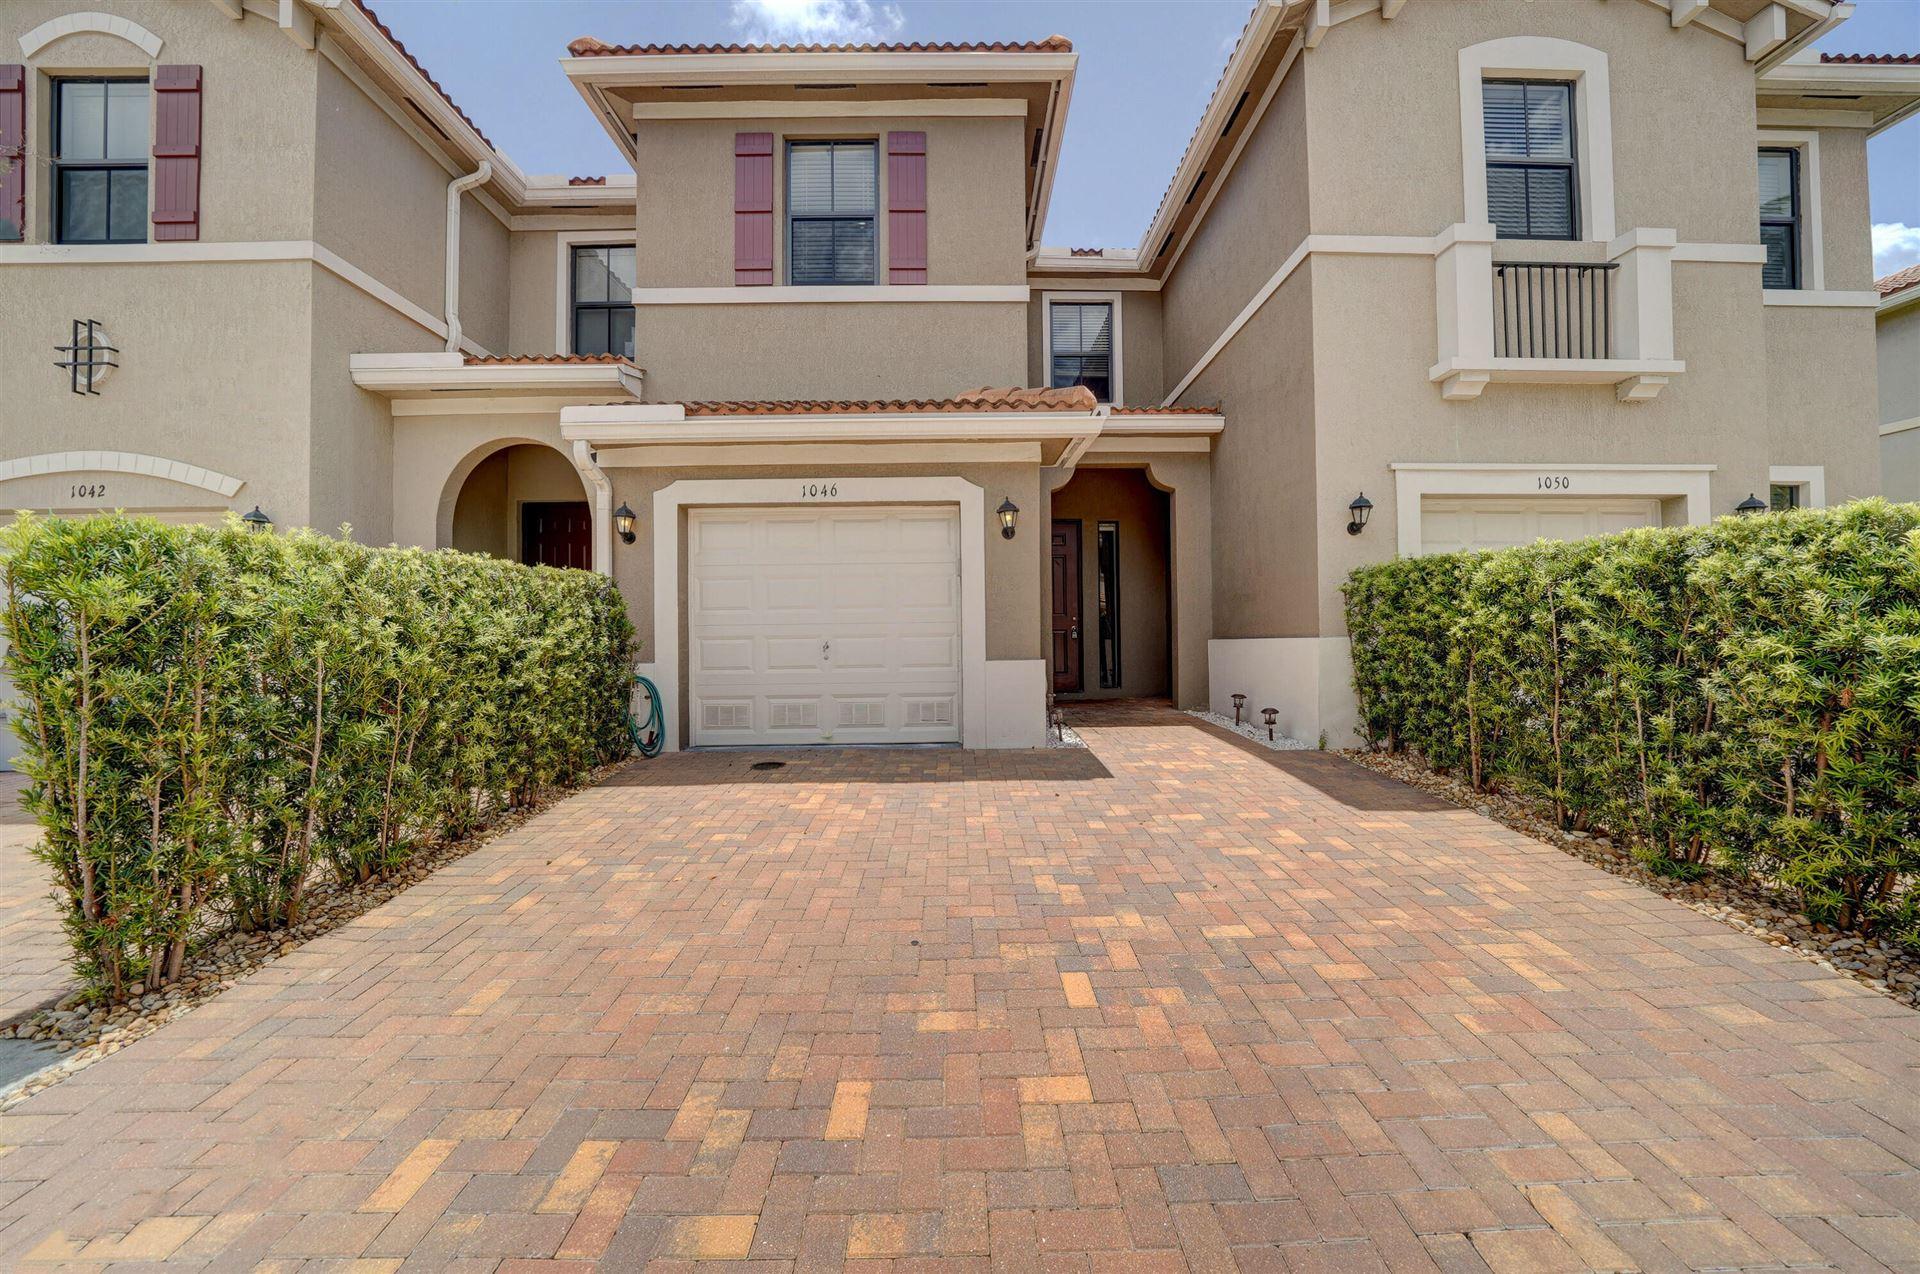 1046 NW 33rd Manor, Pompano Beach, FL 33064 - MLS#: RX-10737753